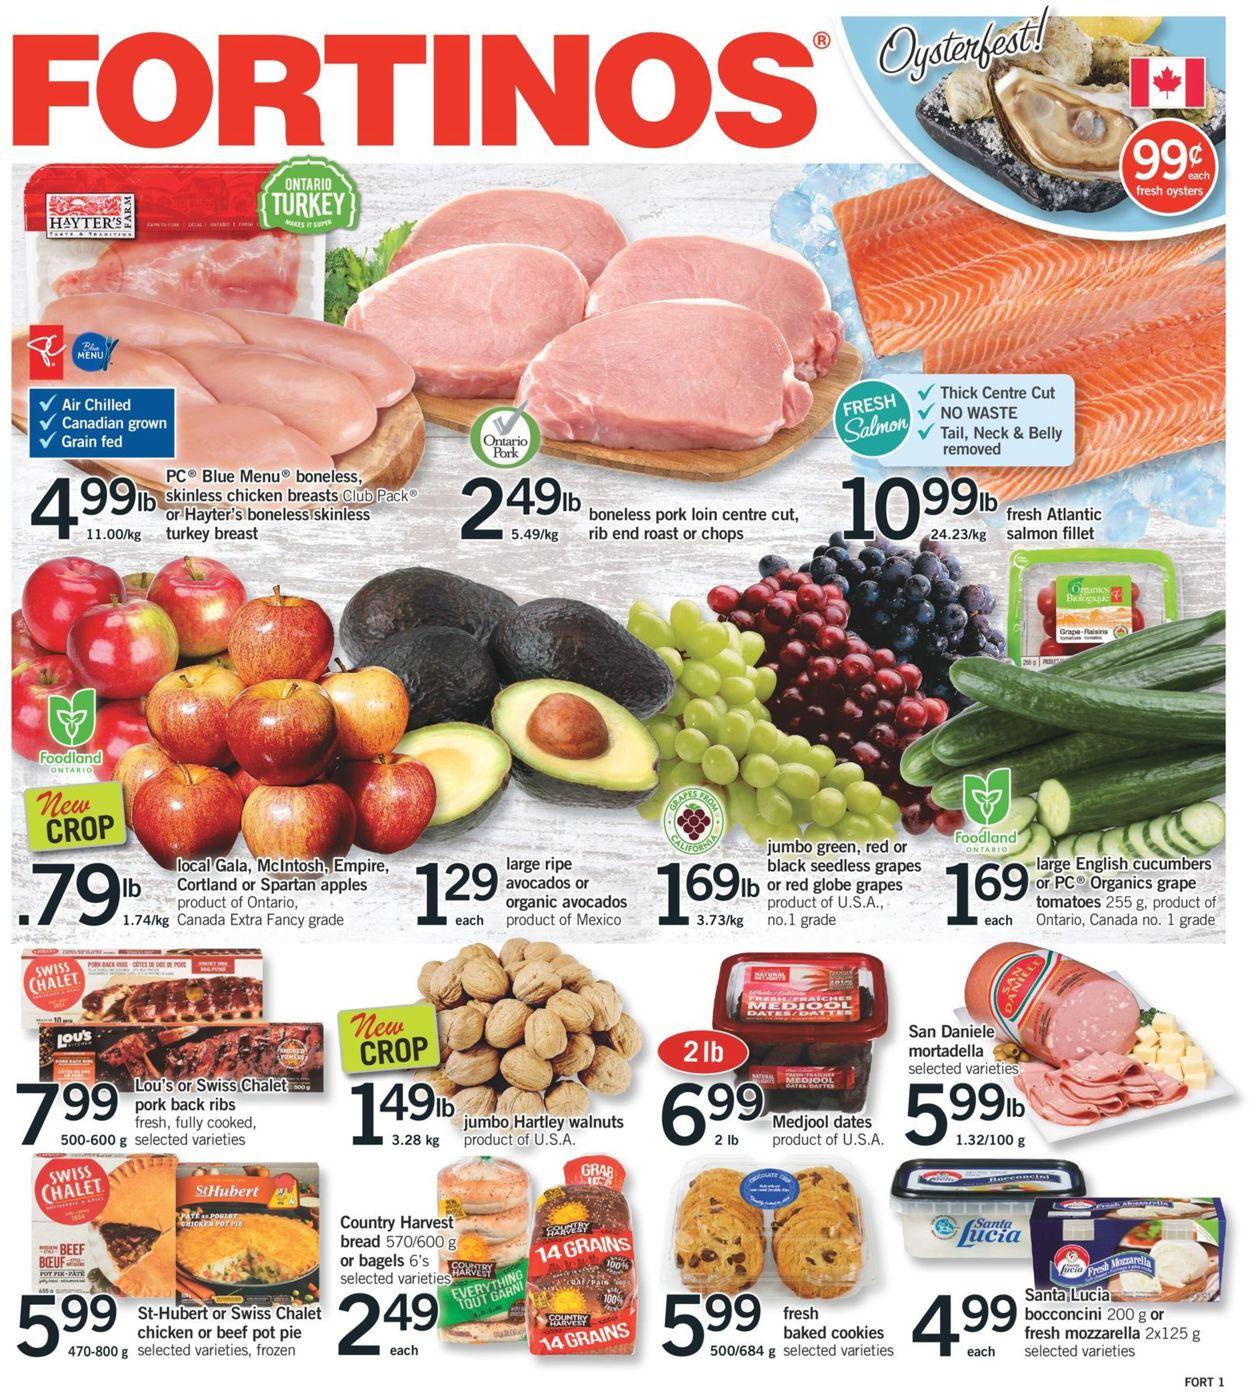 Fortinos Flyer - 10/15-10/21/2020